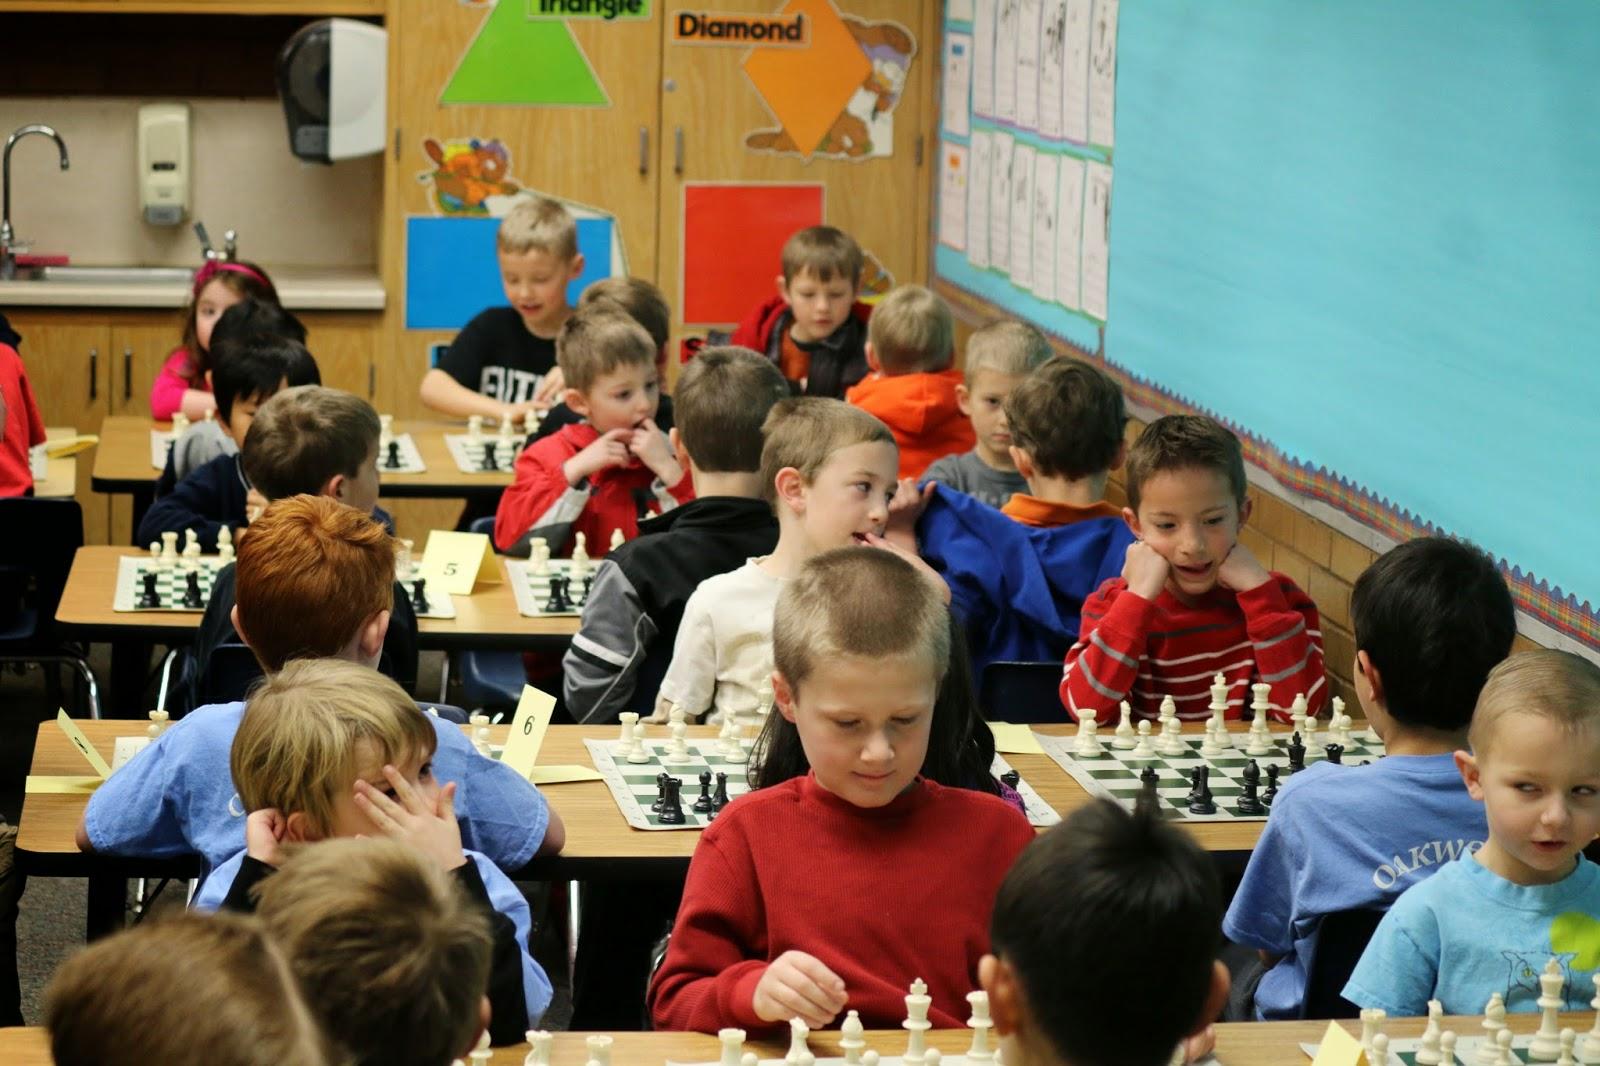 Fun Families 101 Elementary School Chess Club Ideas